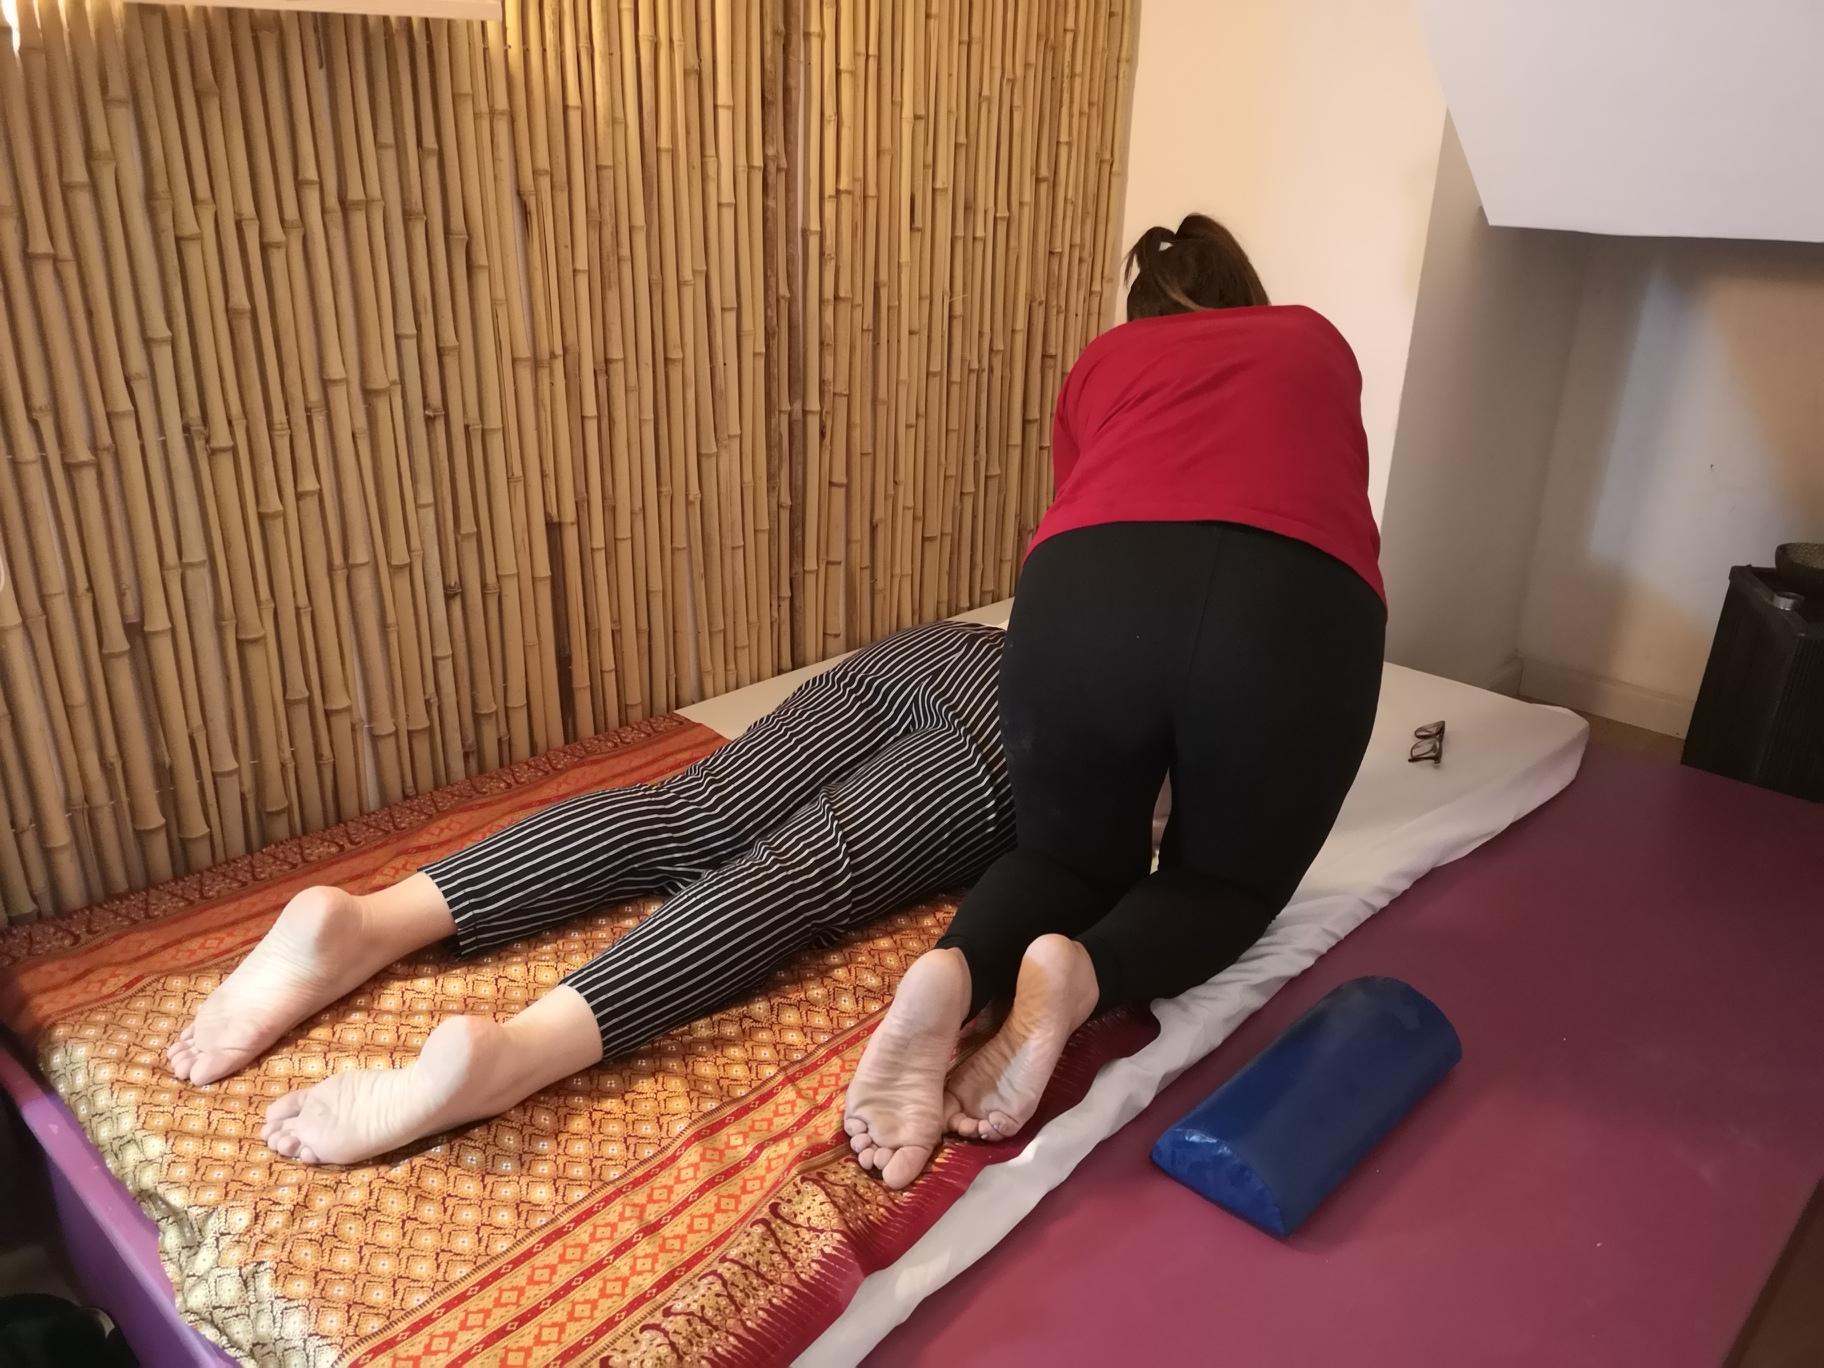 BAMBOO, Thai Massage. ספא בשרון, עיסוי תאילנדי או עיסוי רגליים